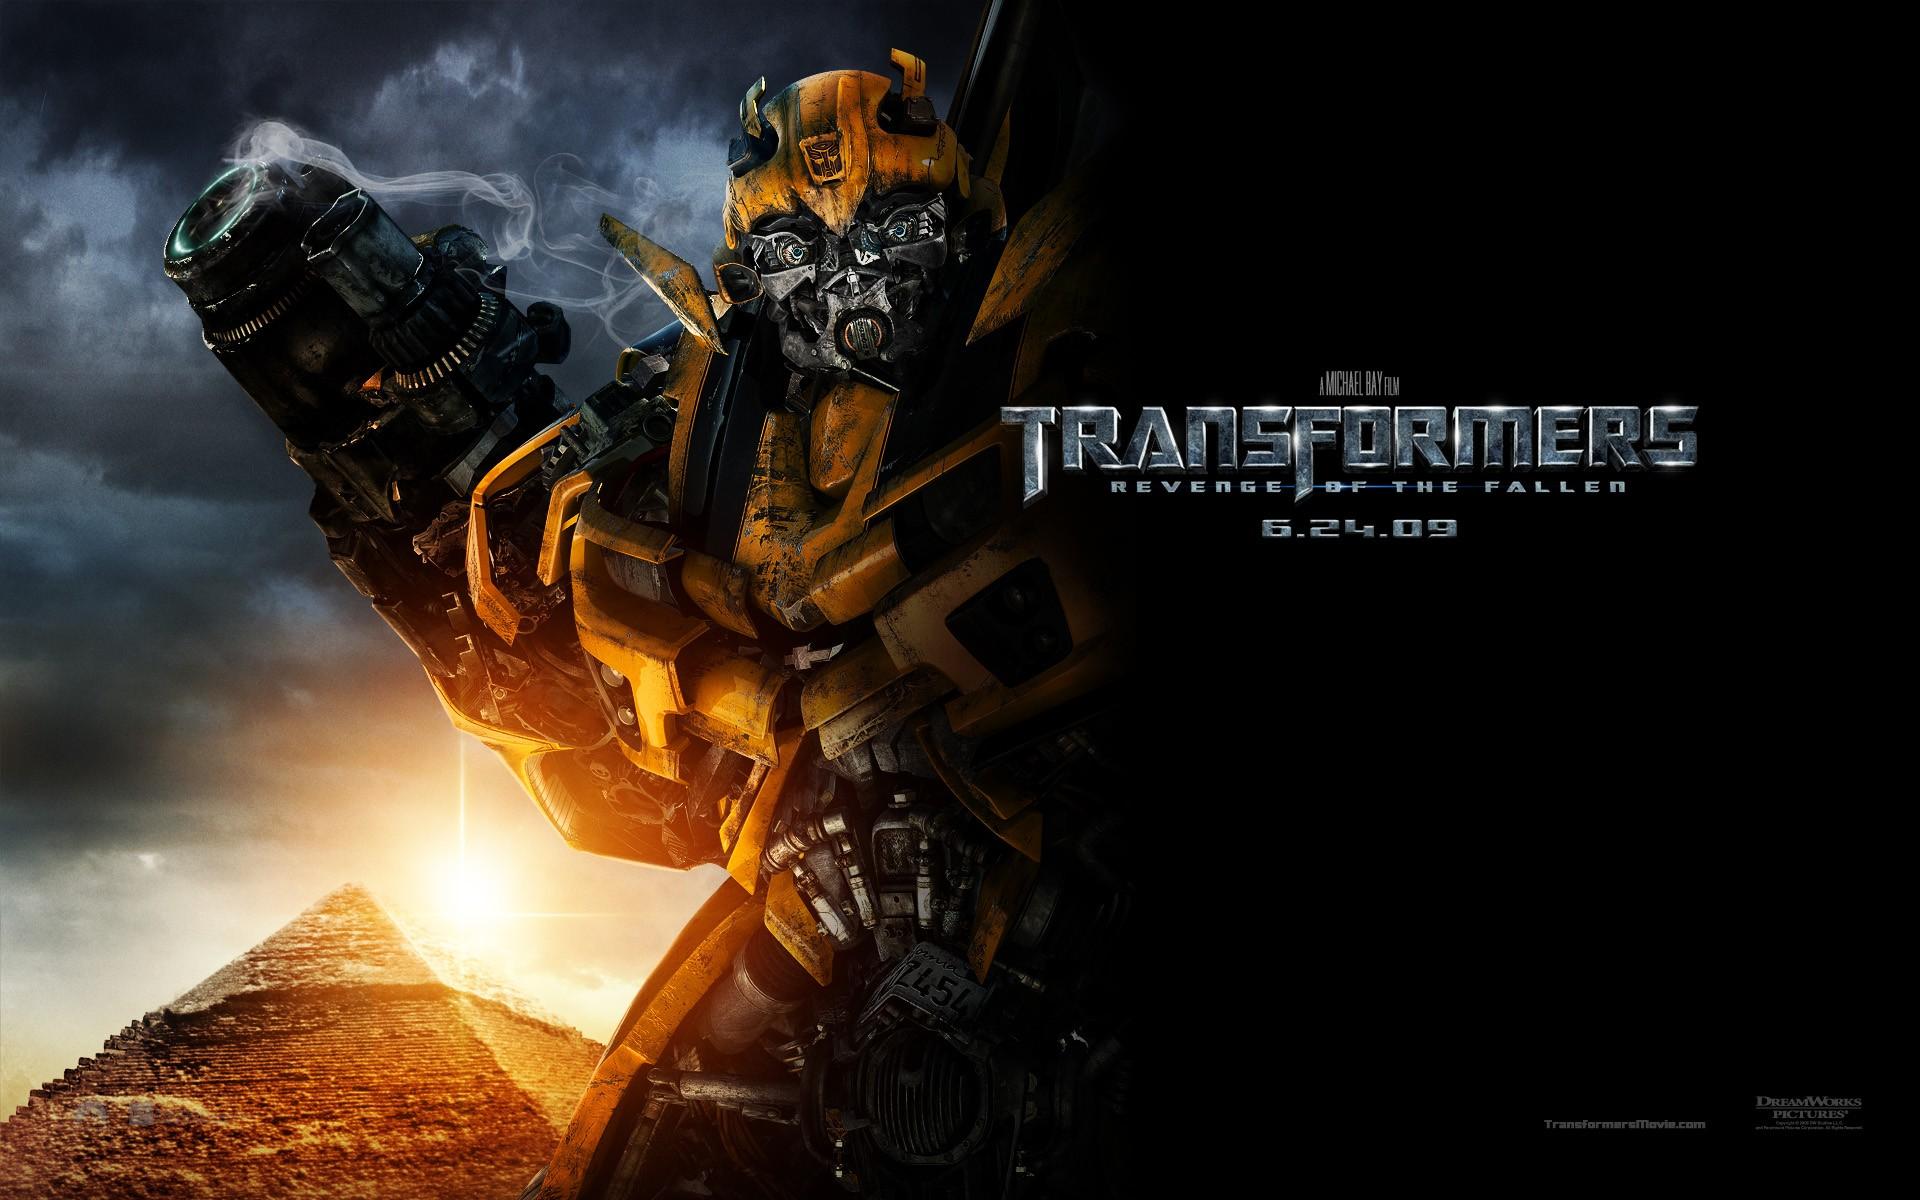 Un wallpaper del film Transformers - La vendetta del caduto, con Bumblebee